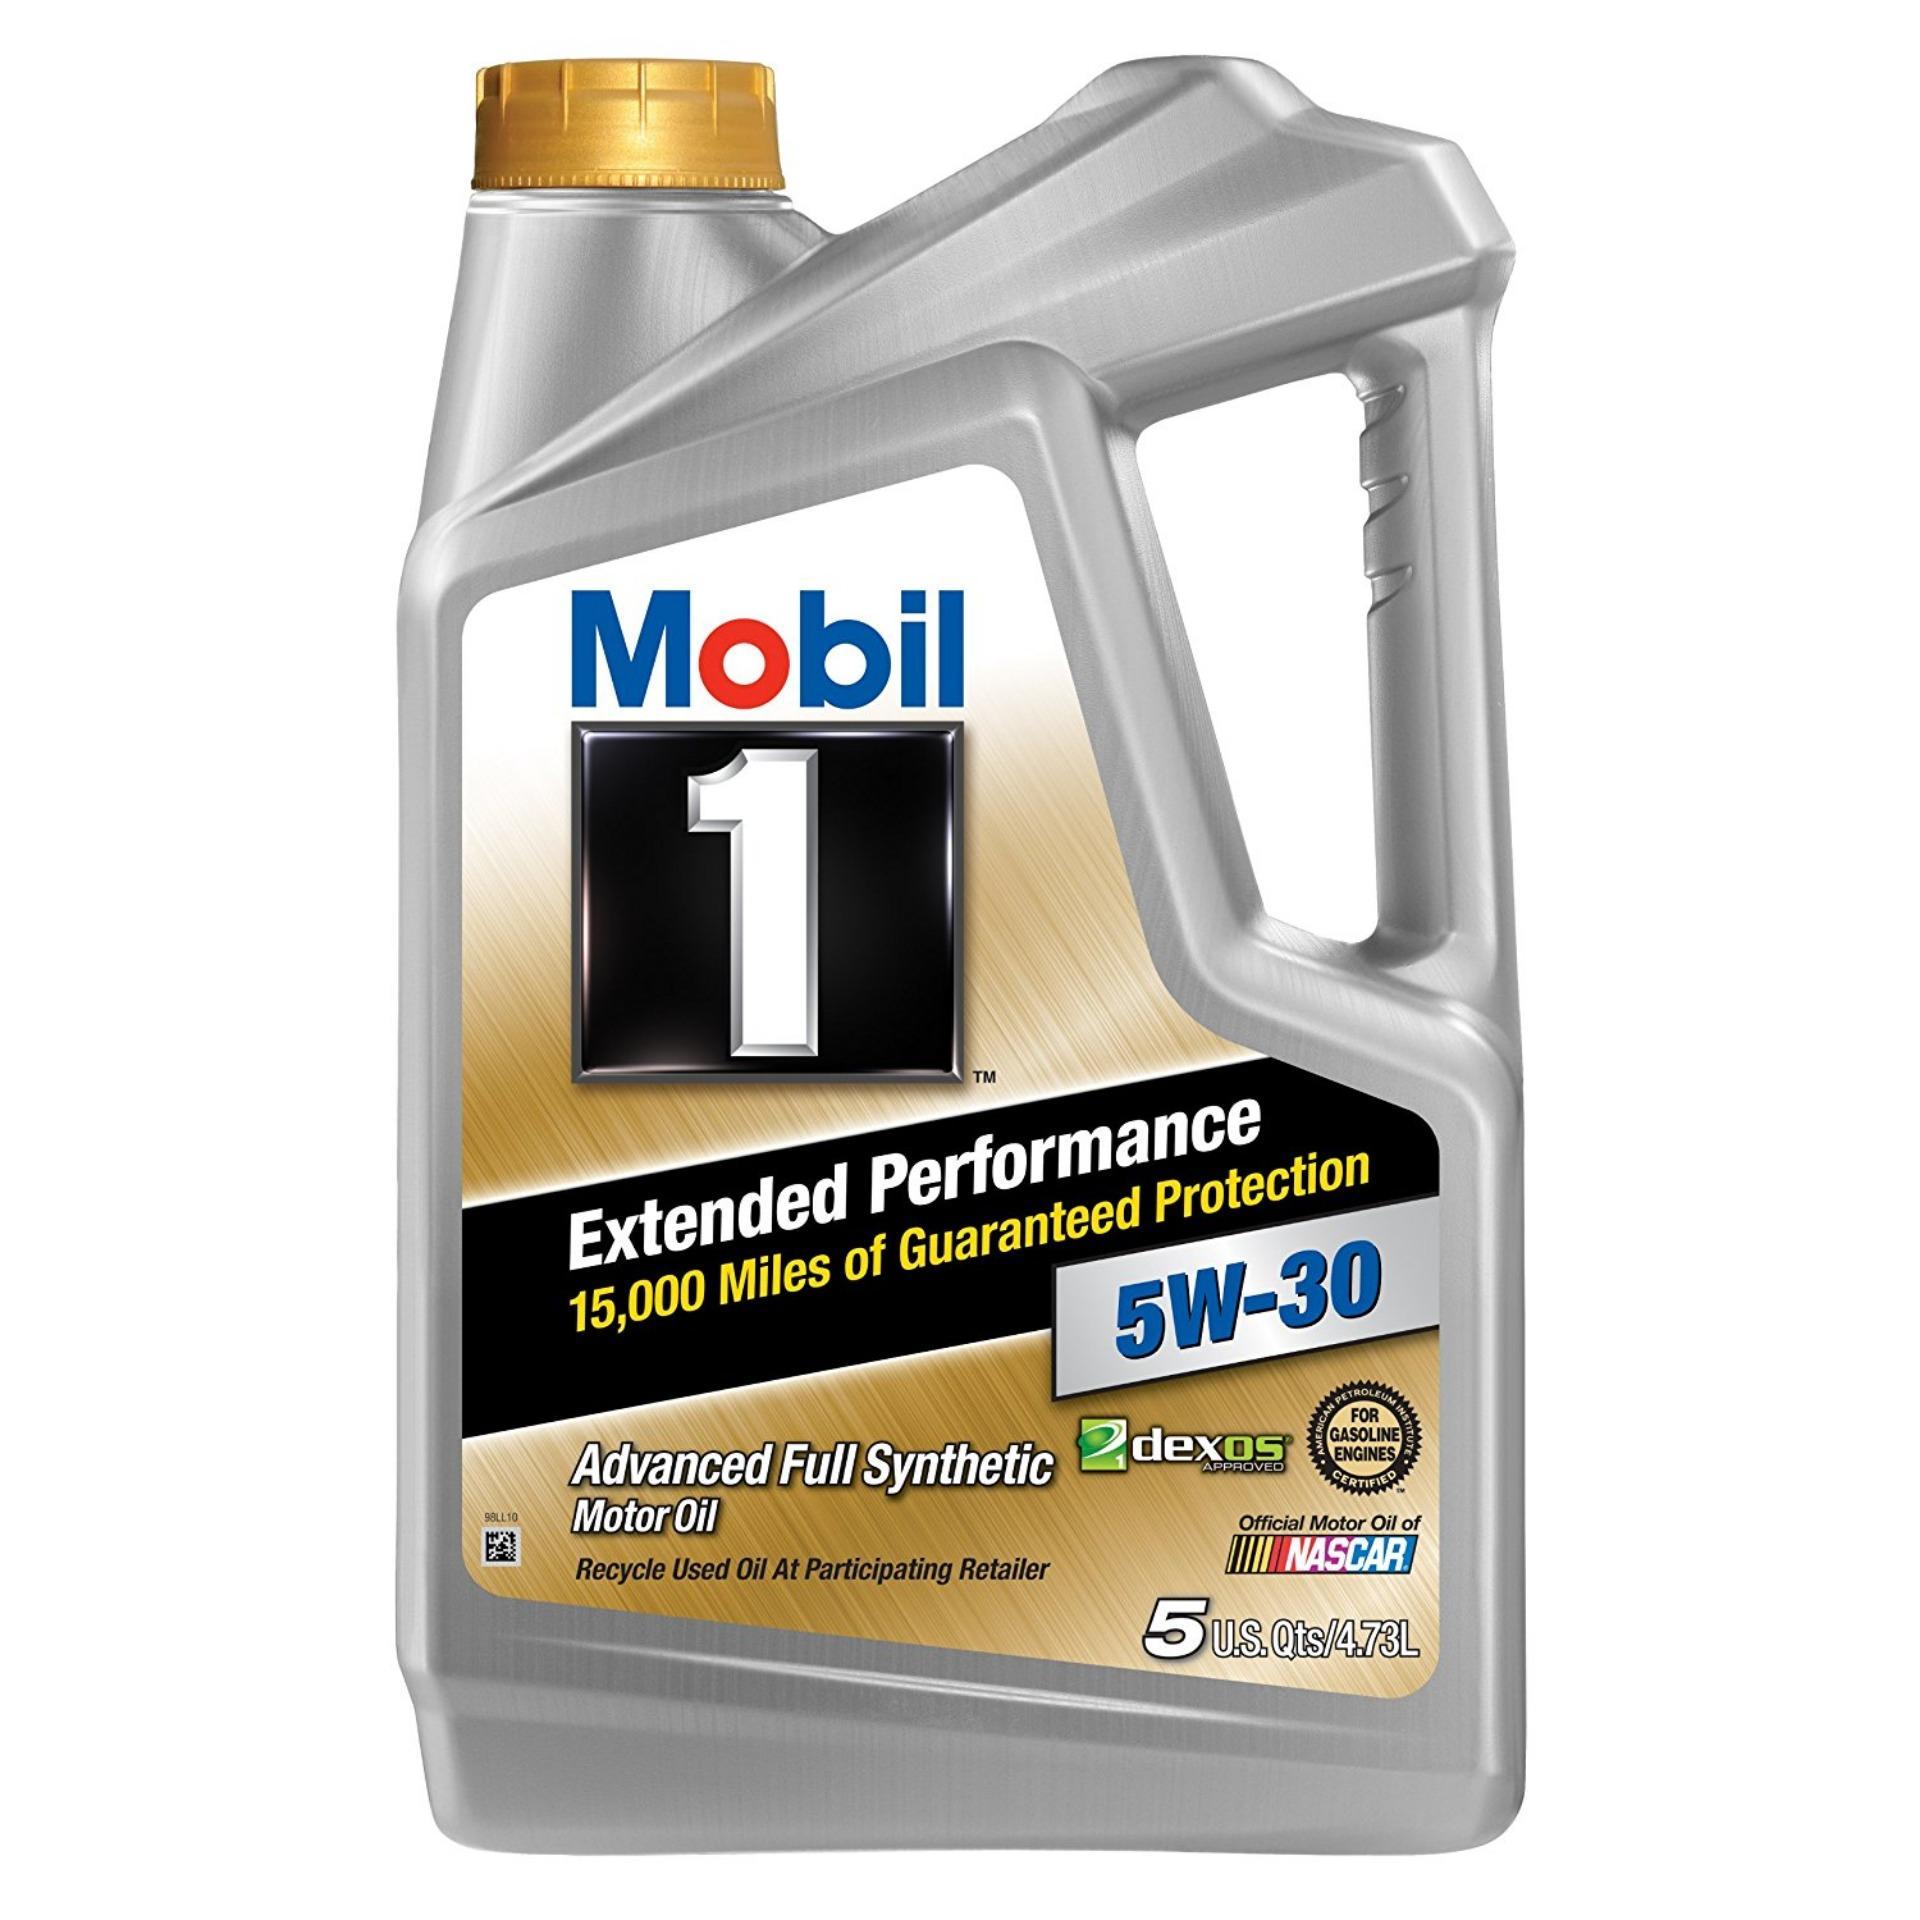 Engine Oil For Sale Motor Online Brands Prices Reviews In Shell Helix Hx5 15w 40 Api Sn Oli Mobil Mesin Bensin 4 Liter 1 120766 Extended Performance 5w 30 5 Quart